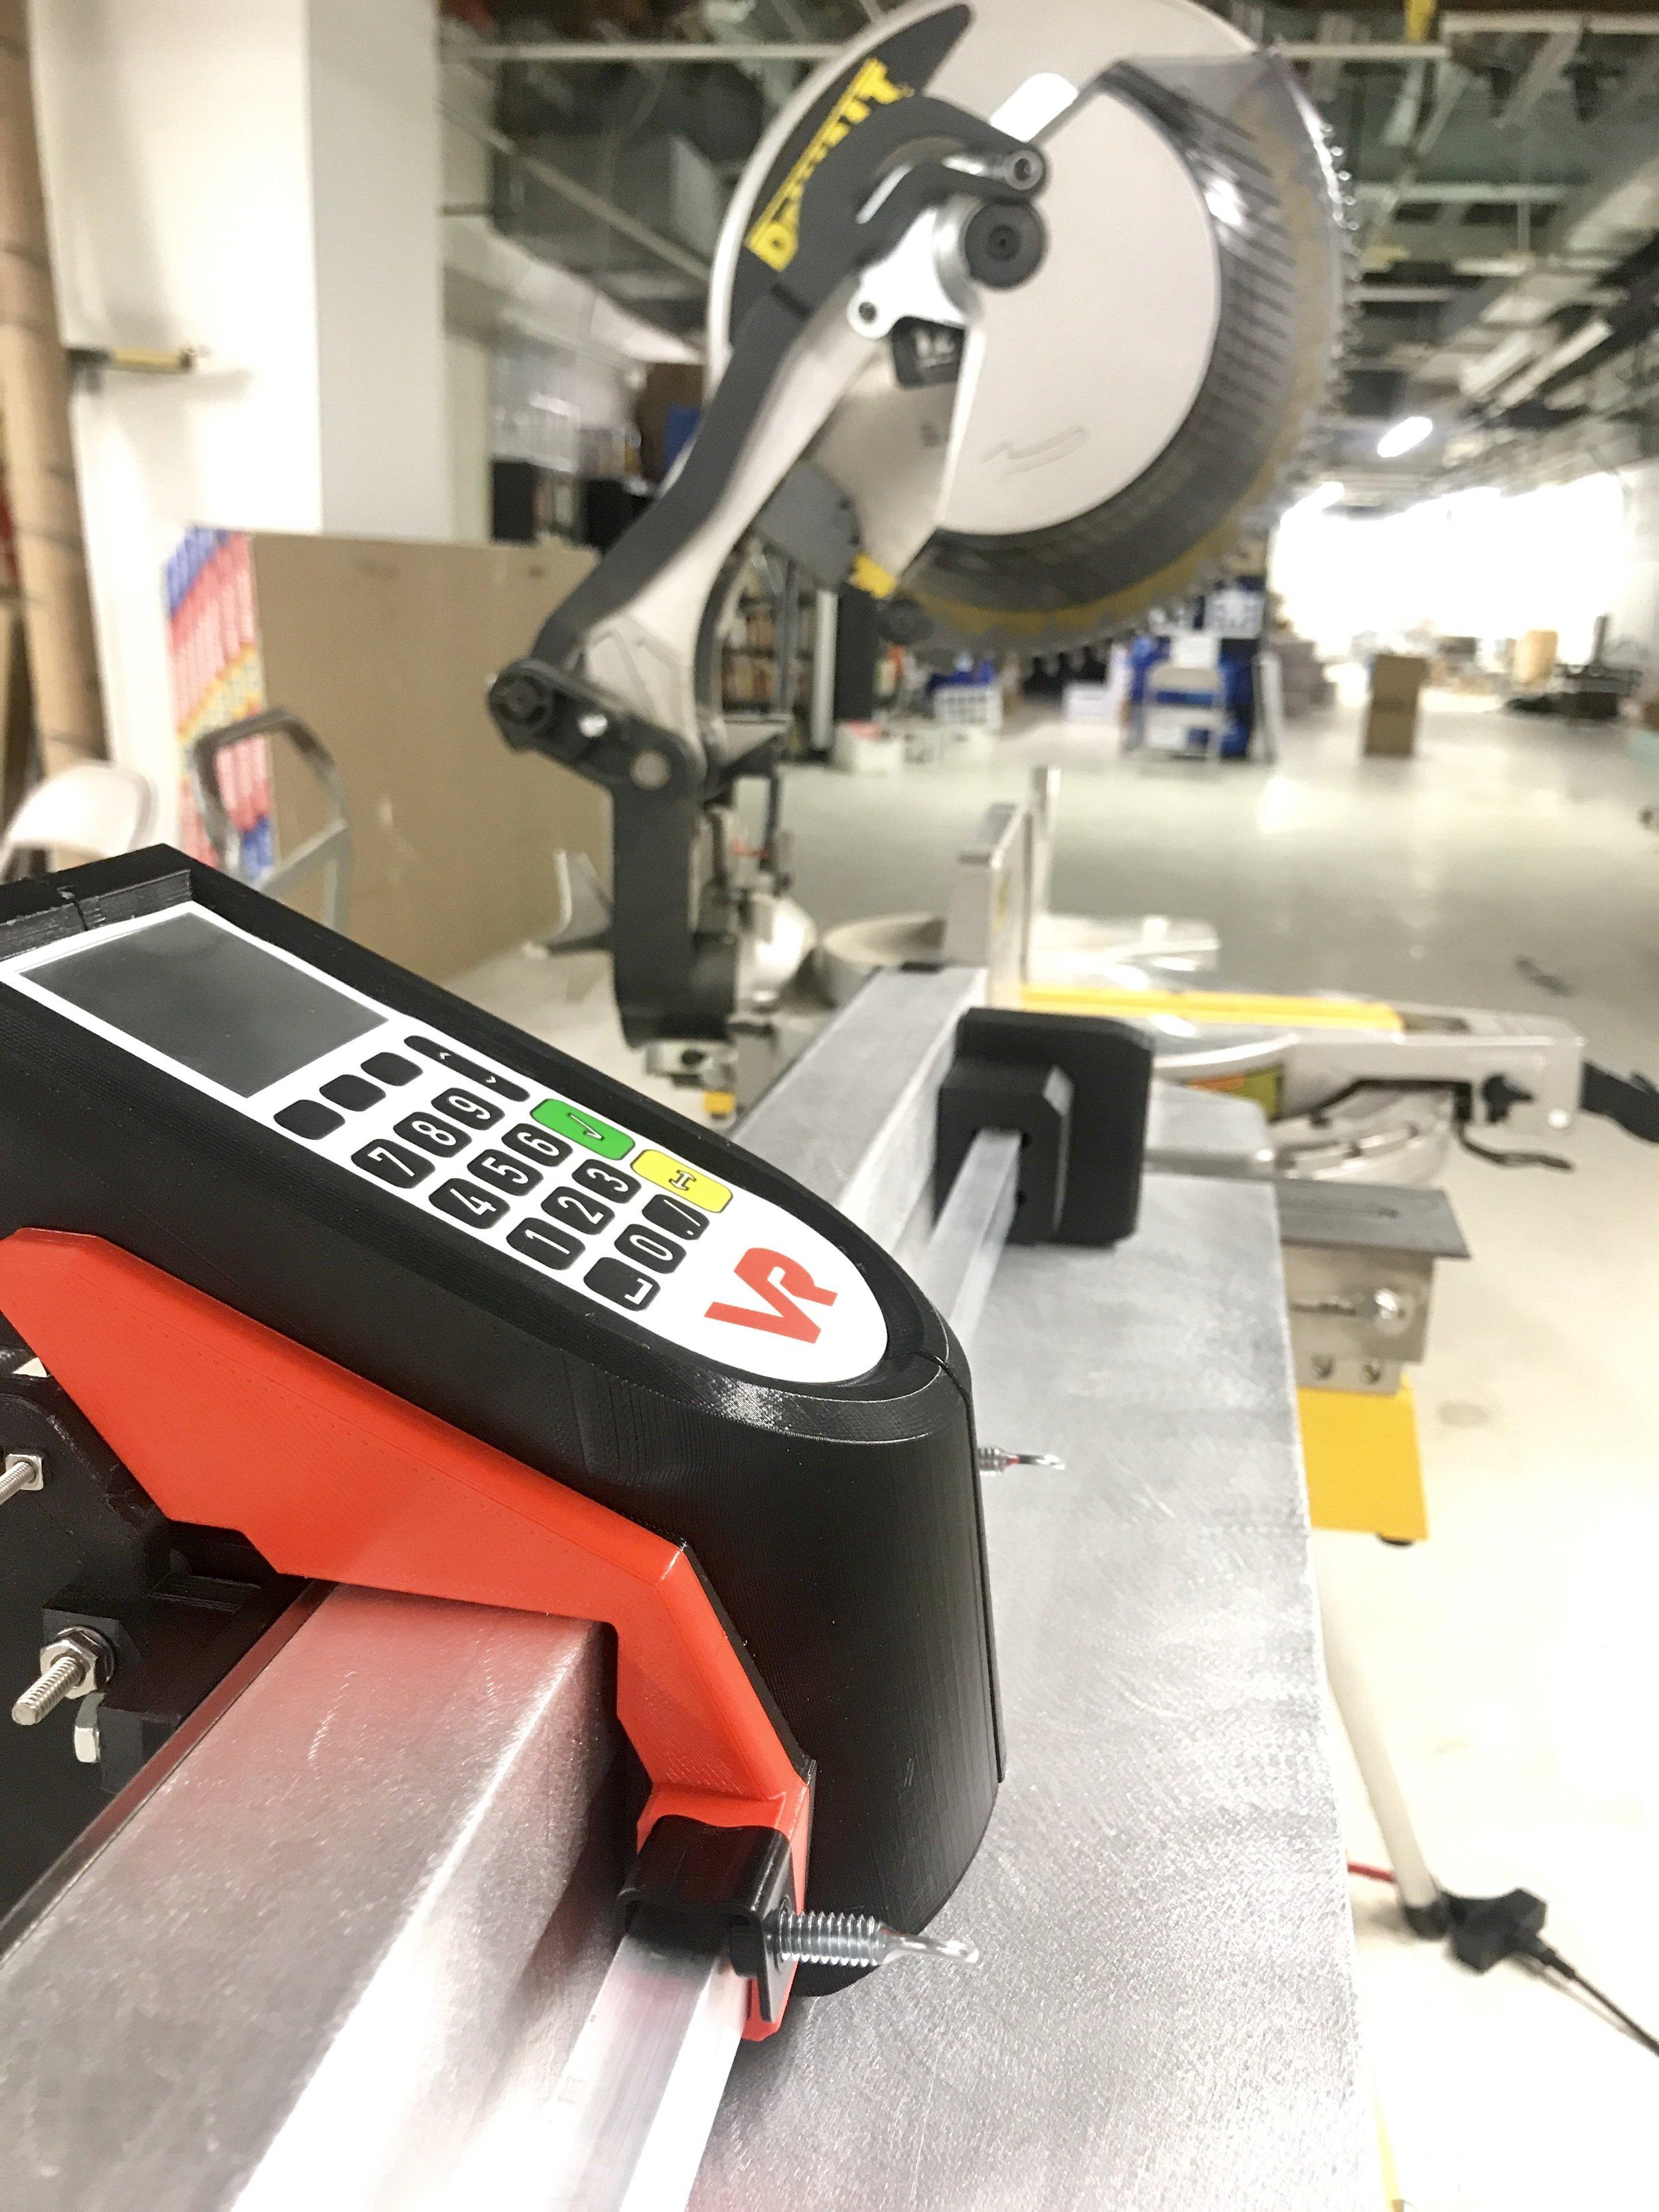 Placing a workpiece against AutoSet's stop (older prototype version)